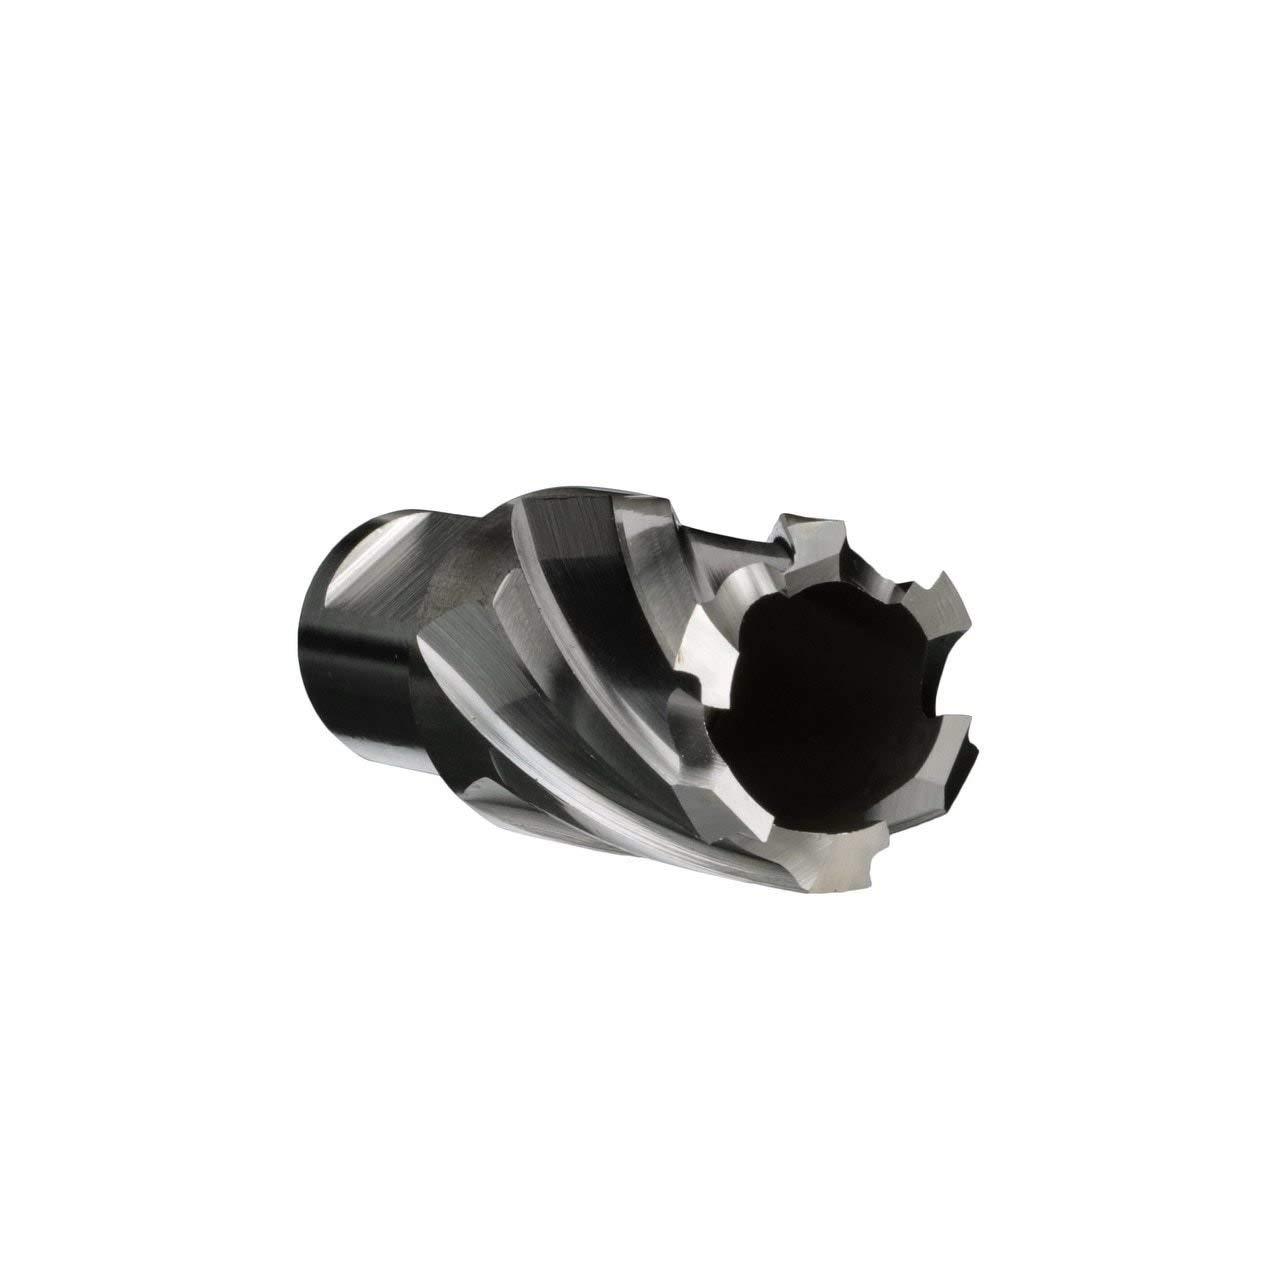 Drill America 2 X 2 High Speed Steel Annular Cutter DWC Series